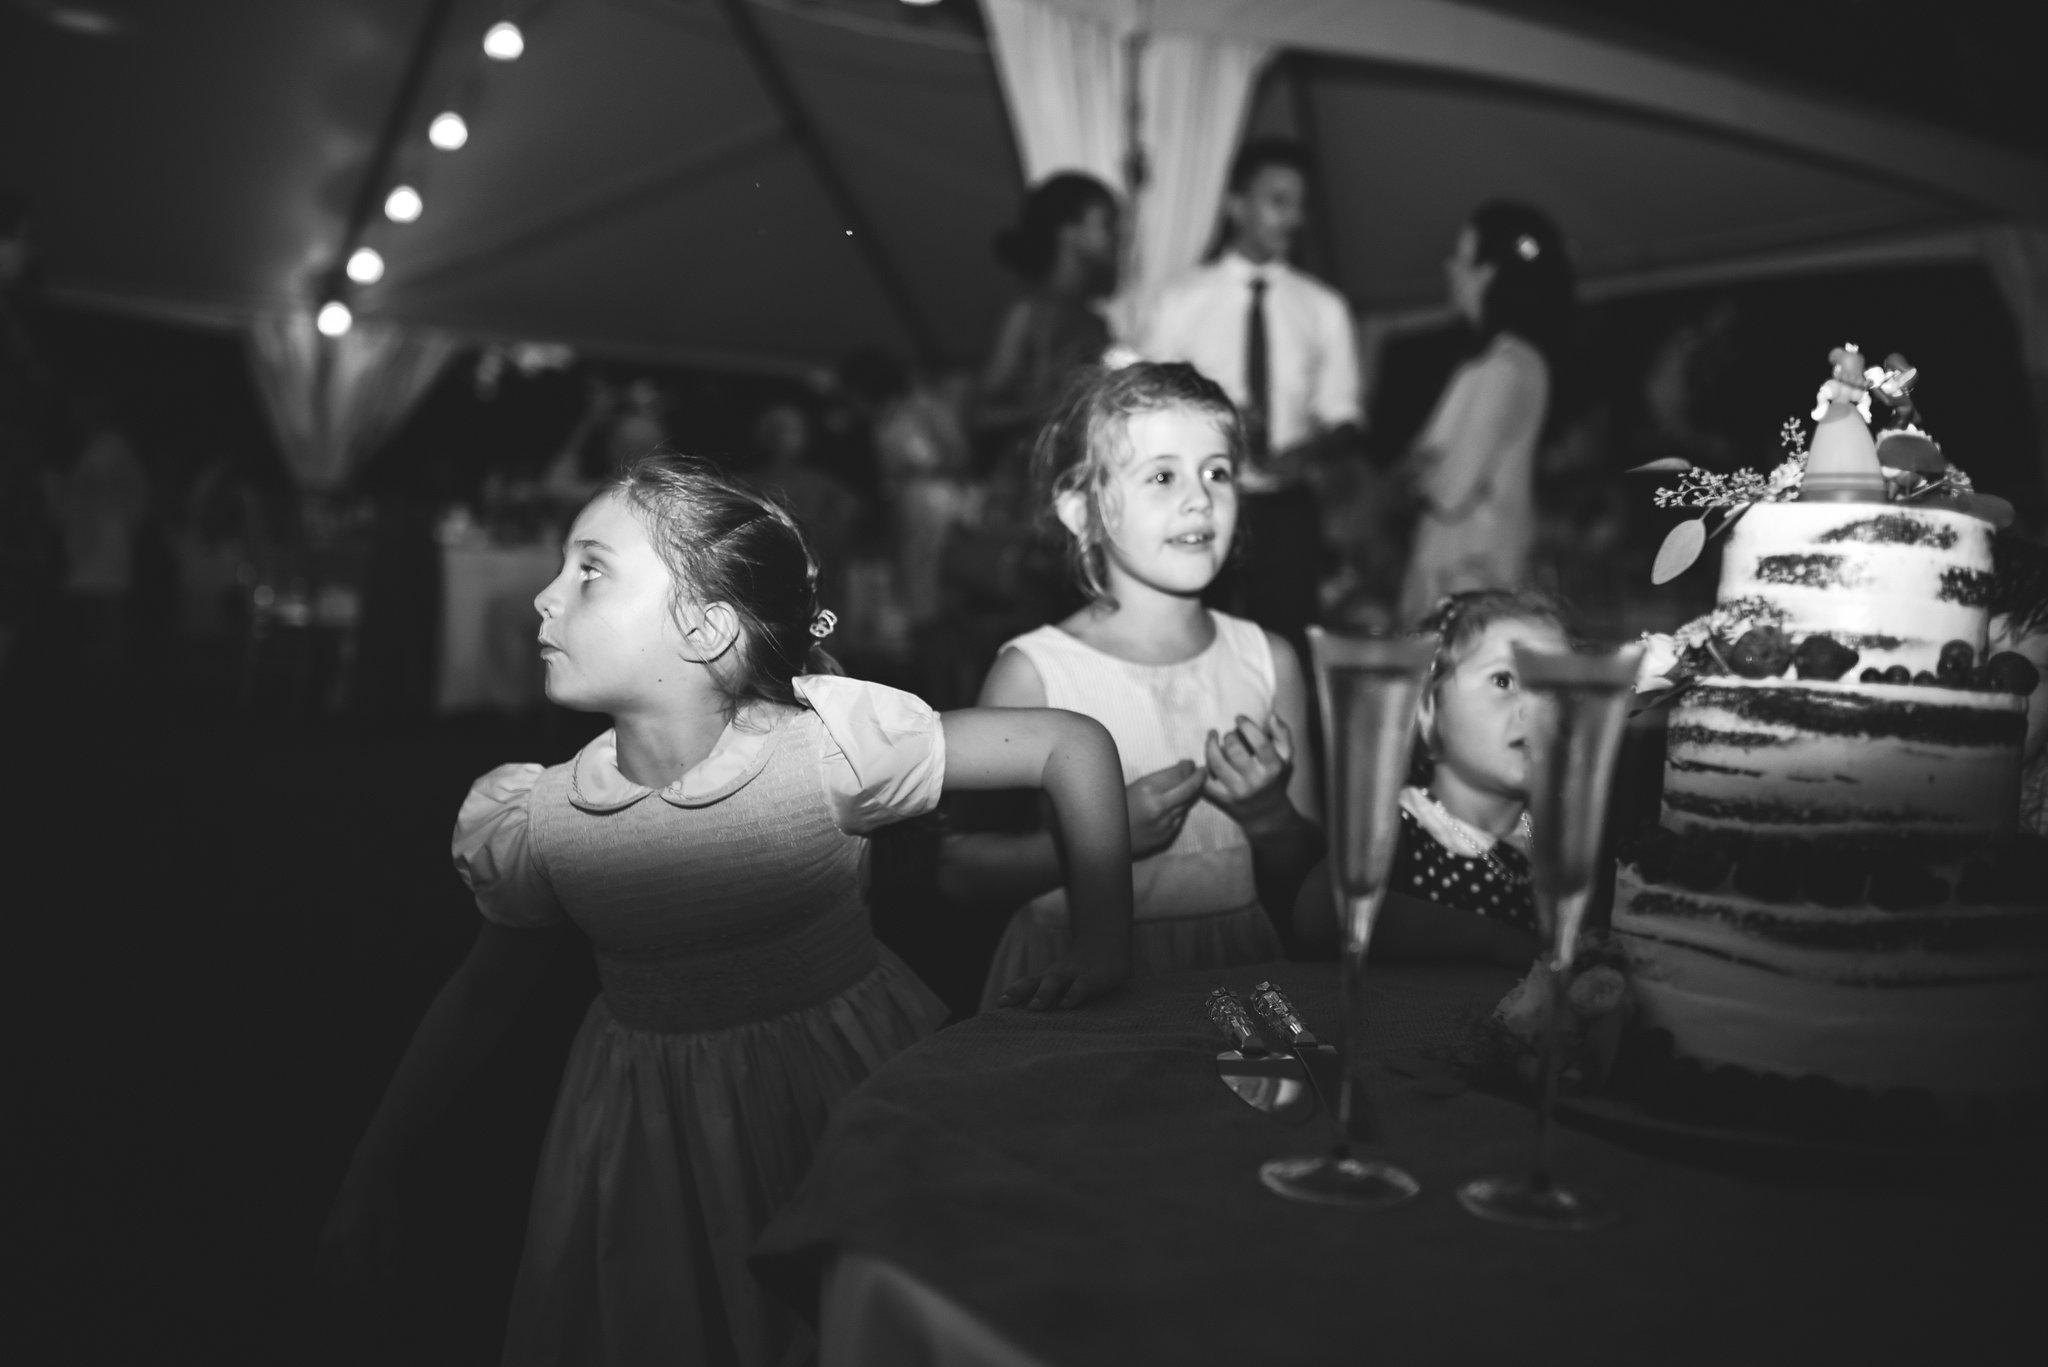 Maryland, Eastern Shore, Baltimore Wedding Photographer, Romantic, Boho, Backyard Wedding, Nature, Little Girls Having Fun at Reception, Black and White Photo